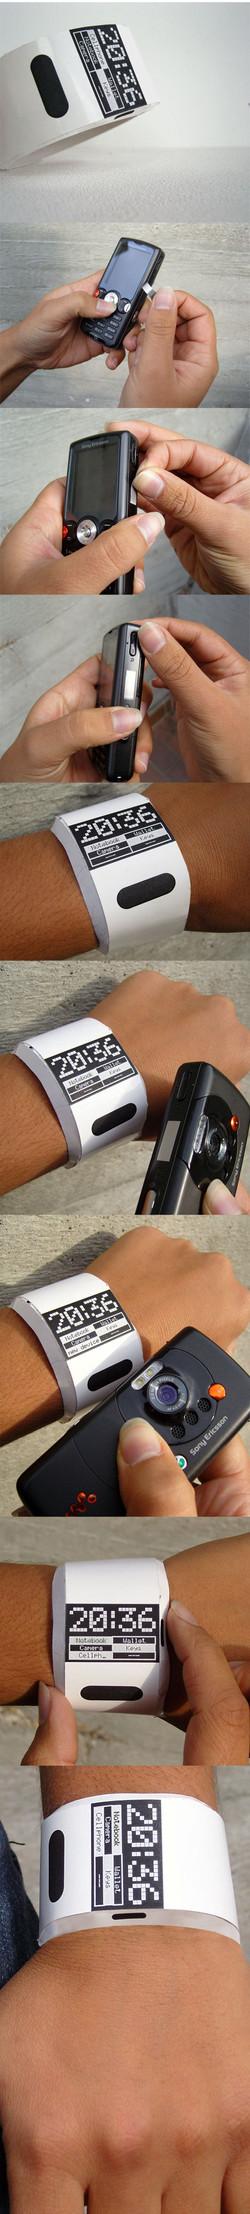 4_3_RFID-watchewr